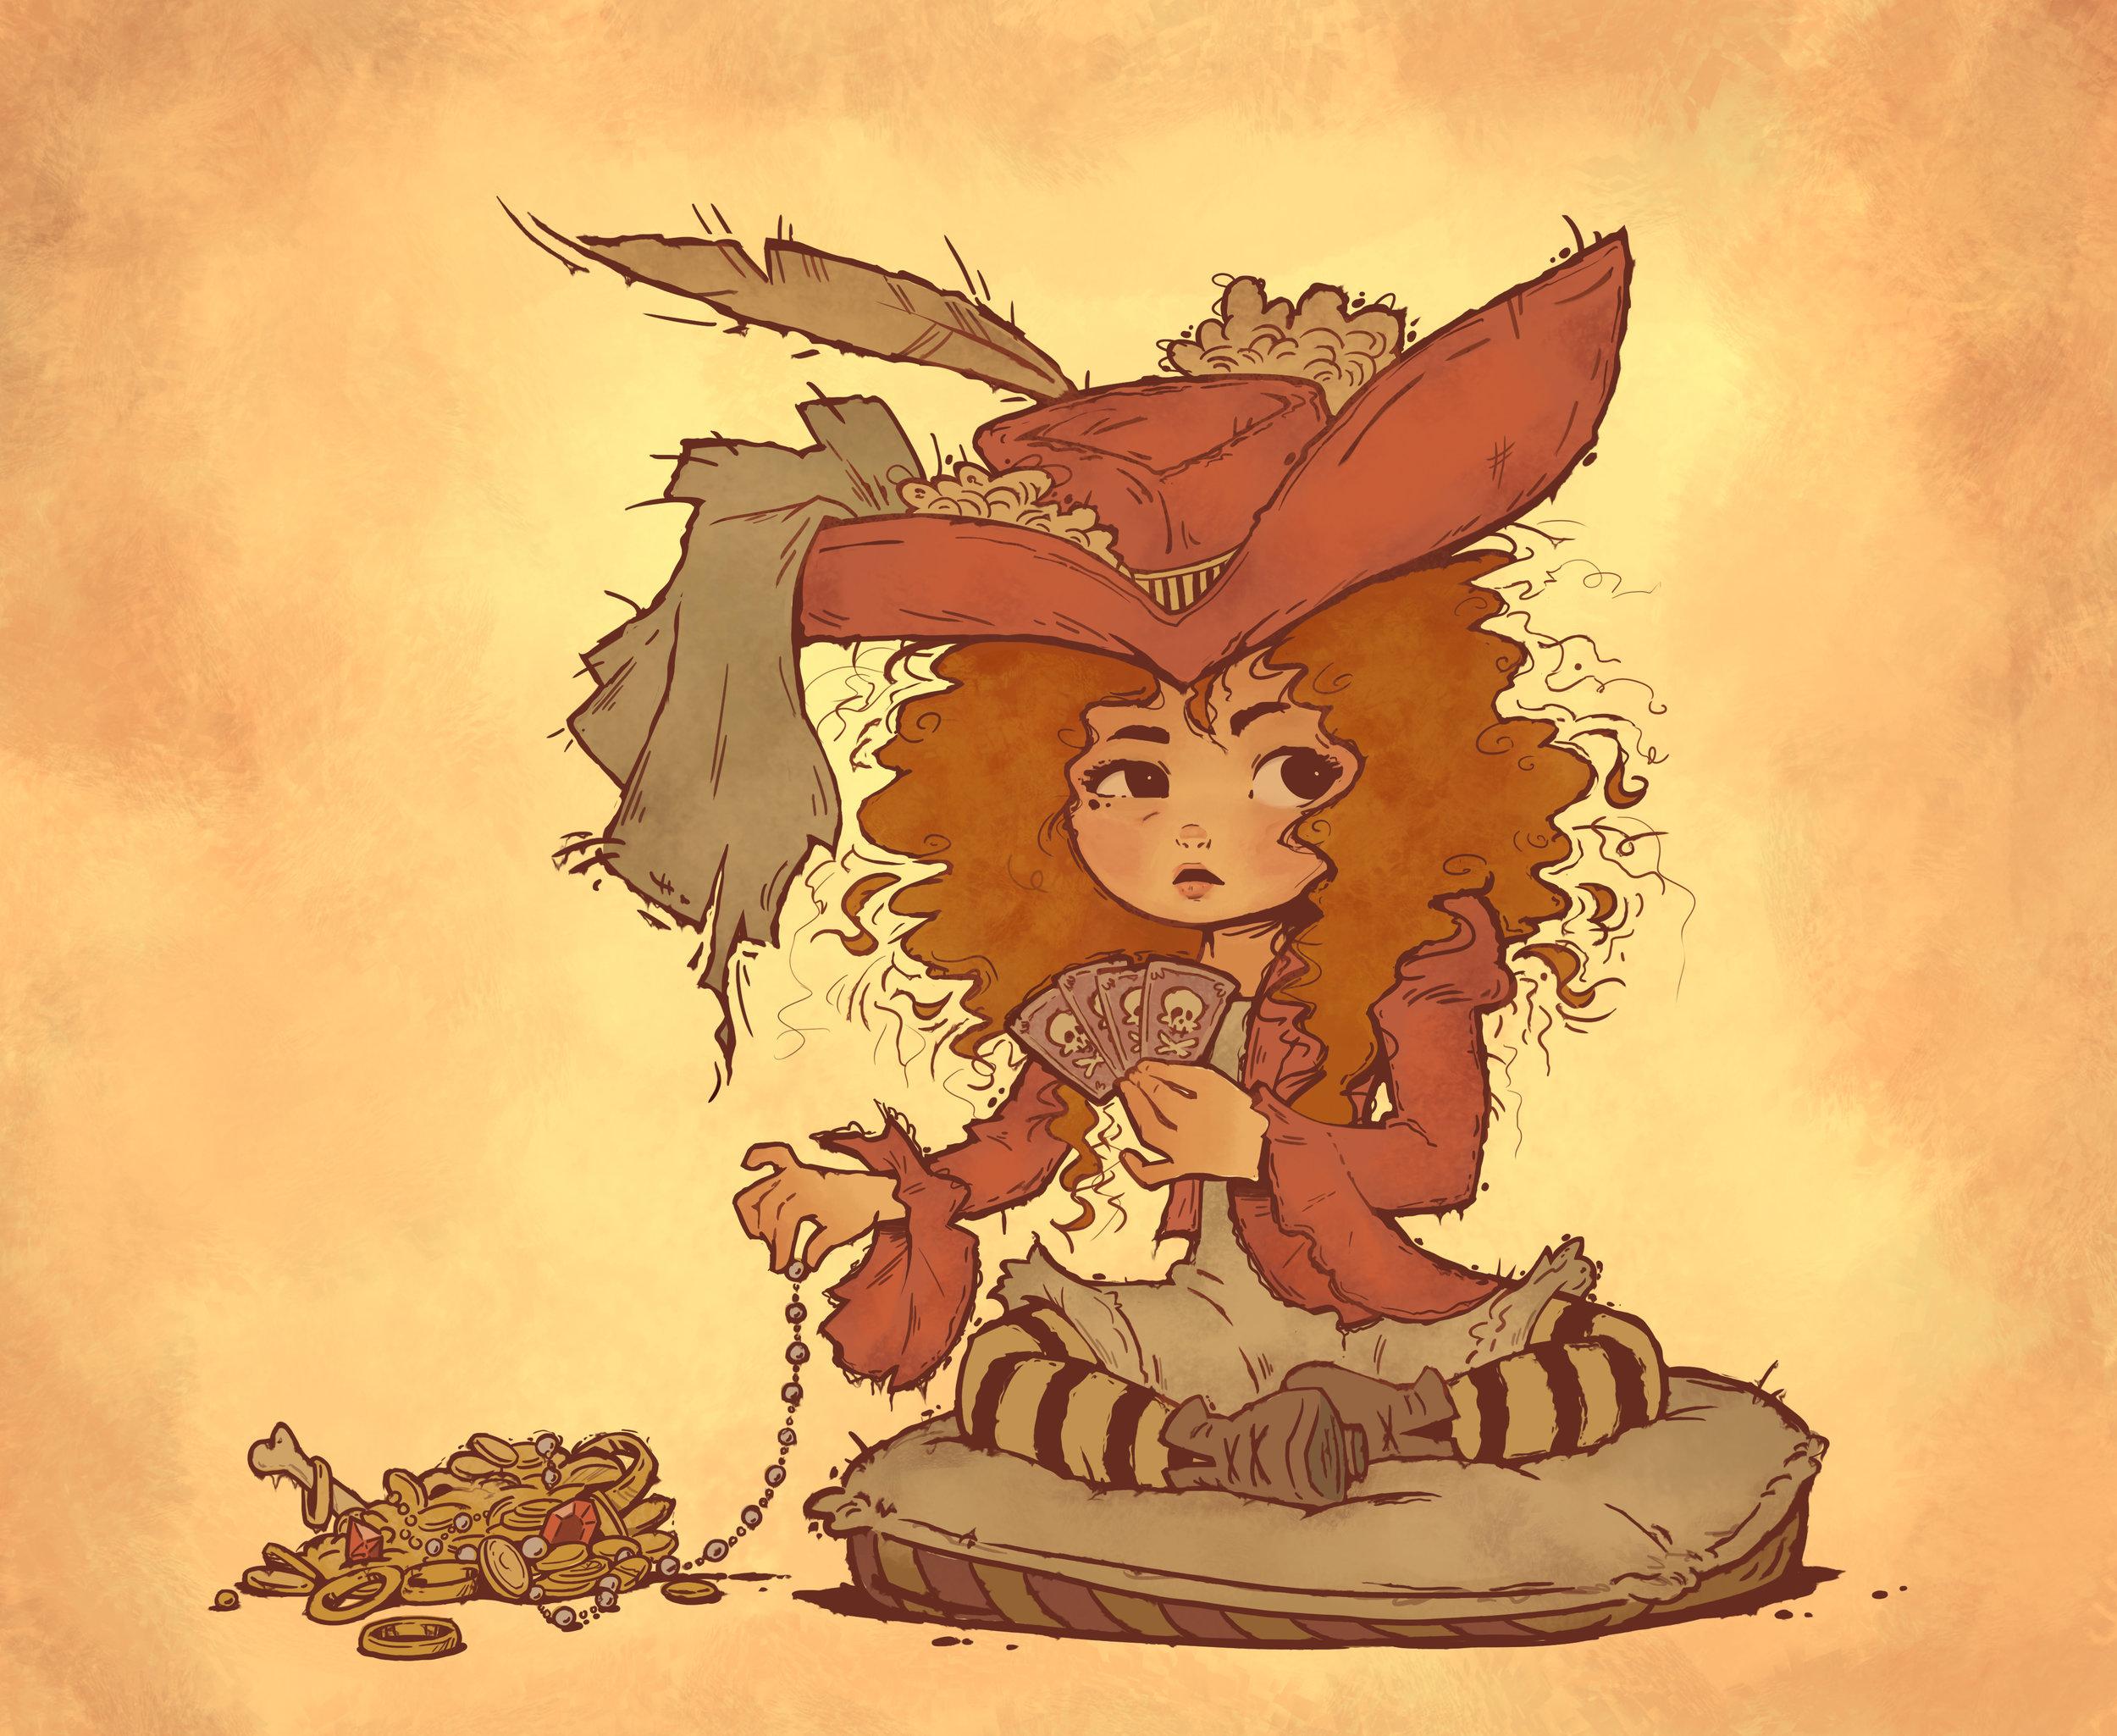 pirate lady_v2.jpg